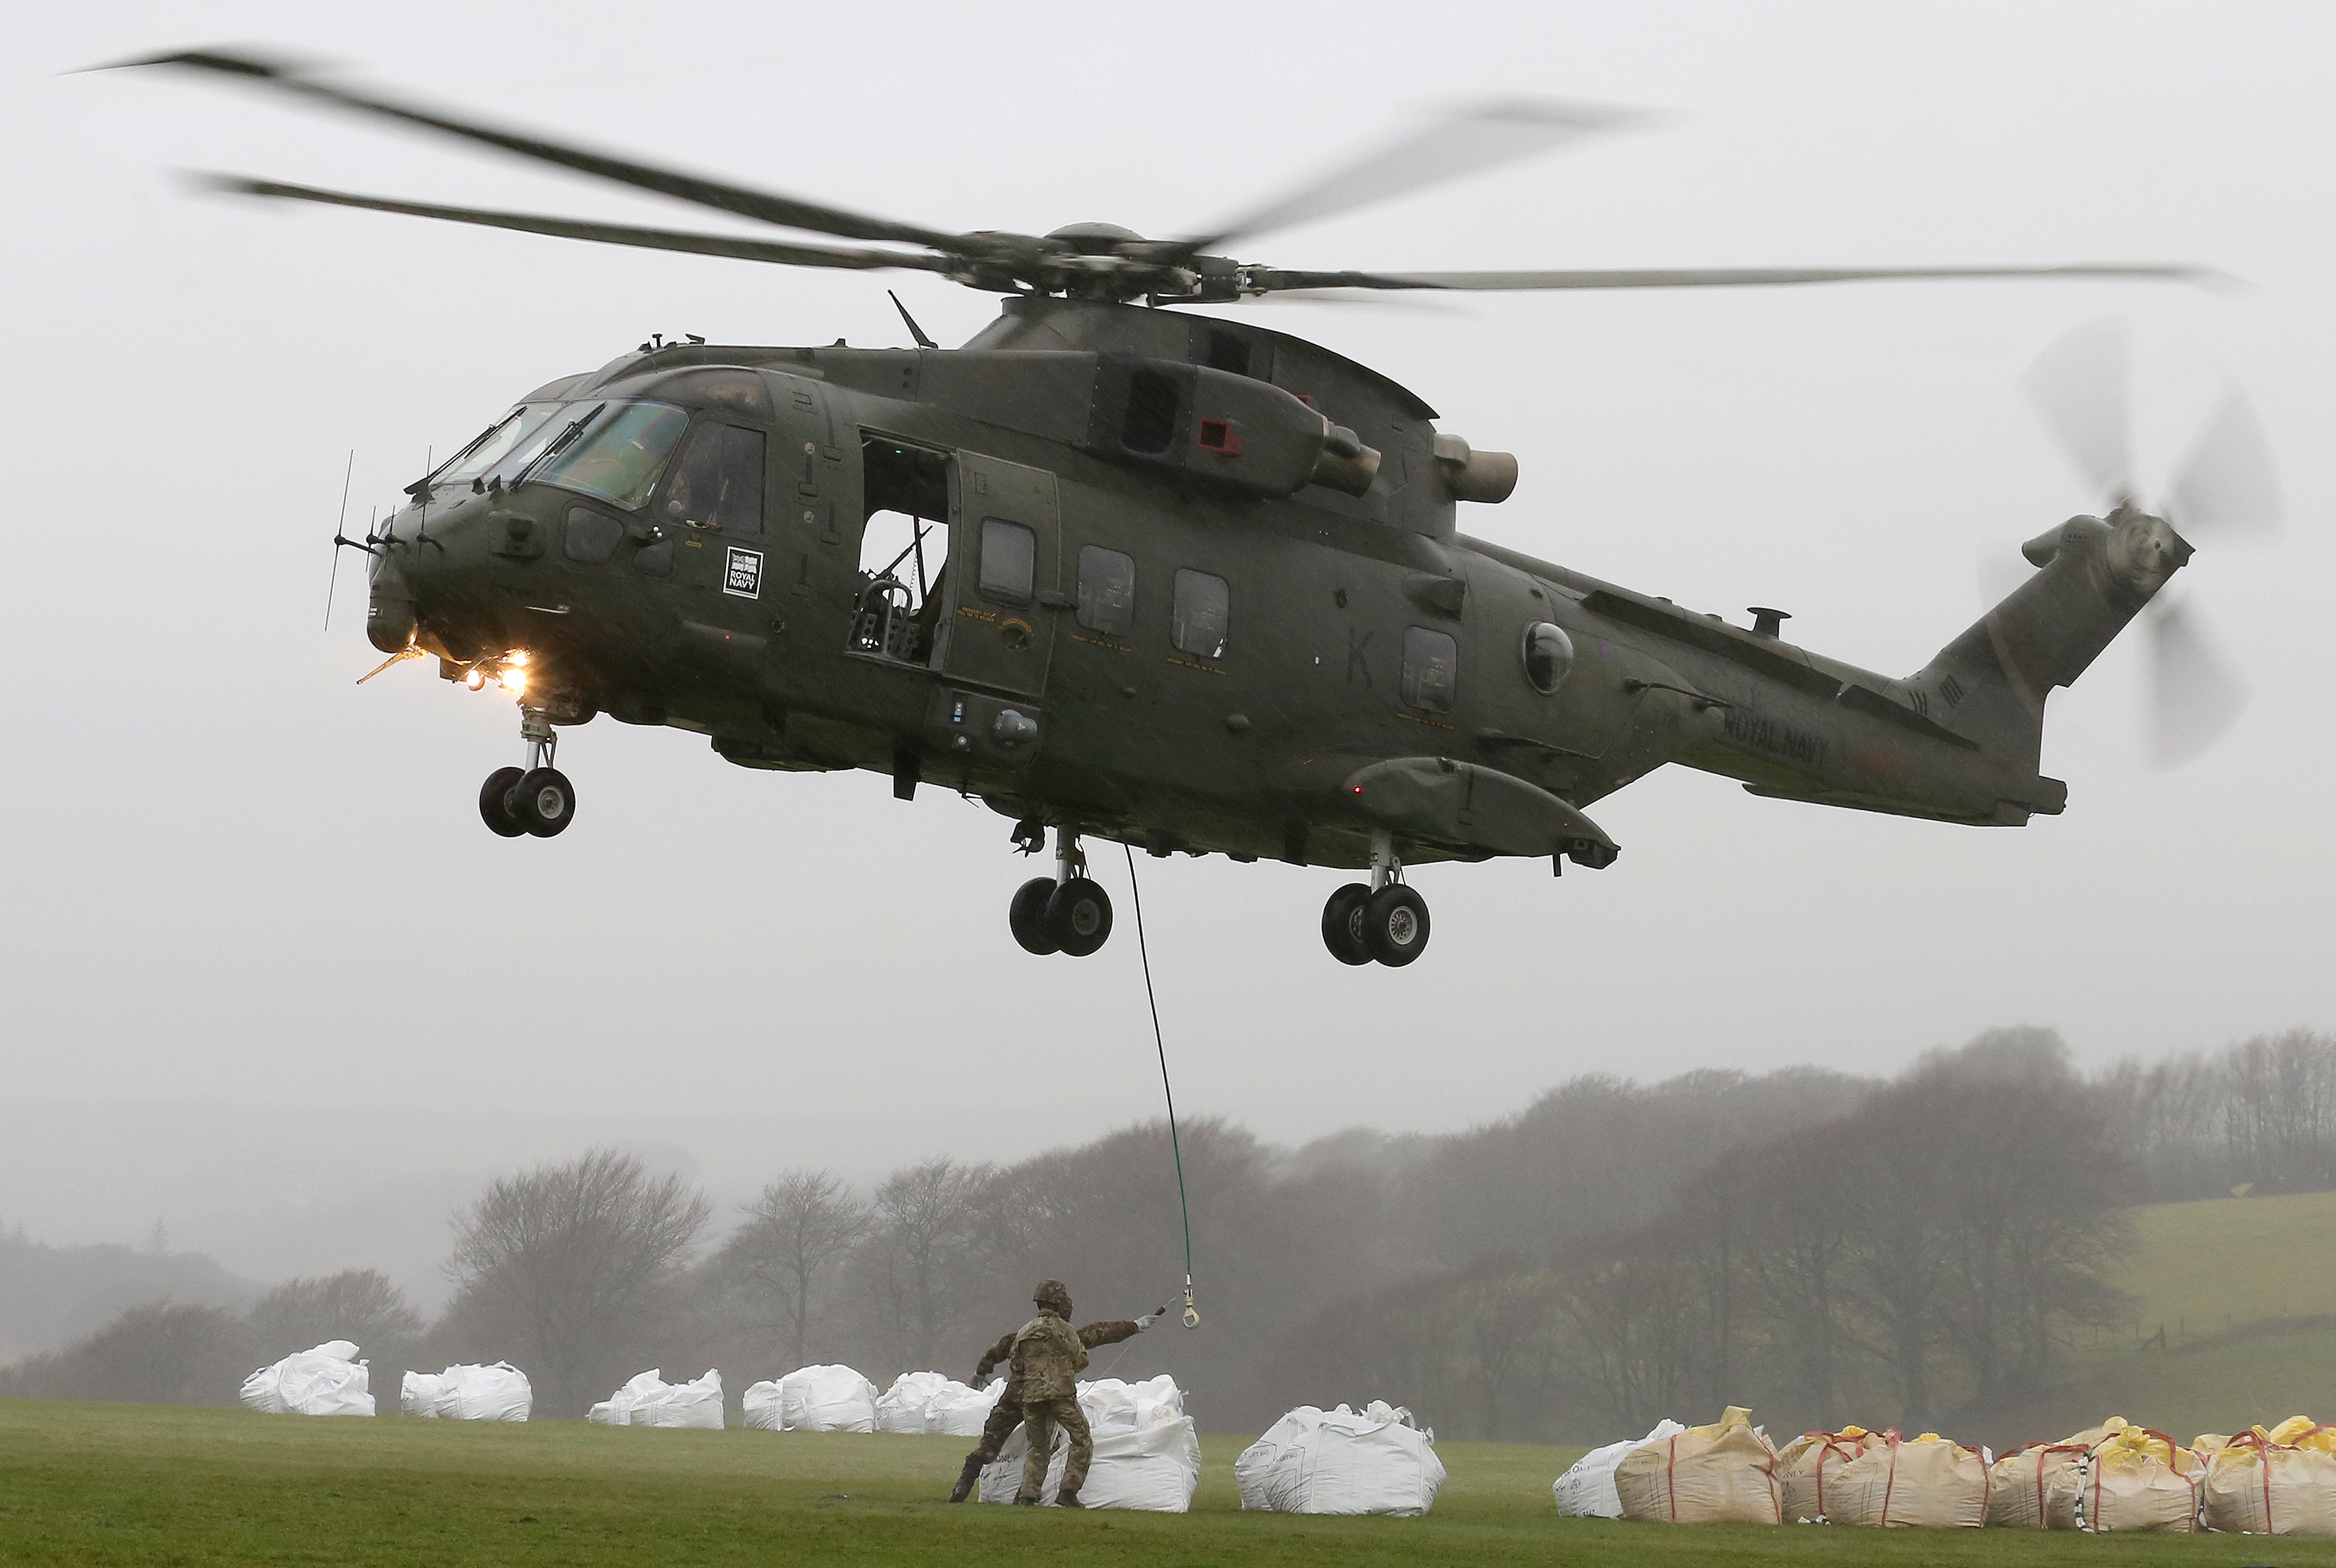 MERLIN HELICOPTERS HELP MEND EXMOOR'S PATHS